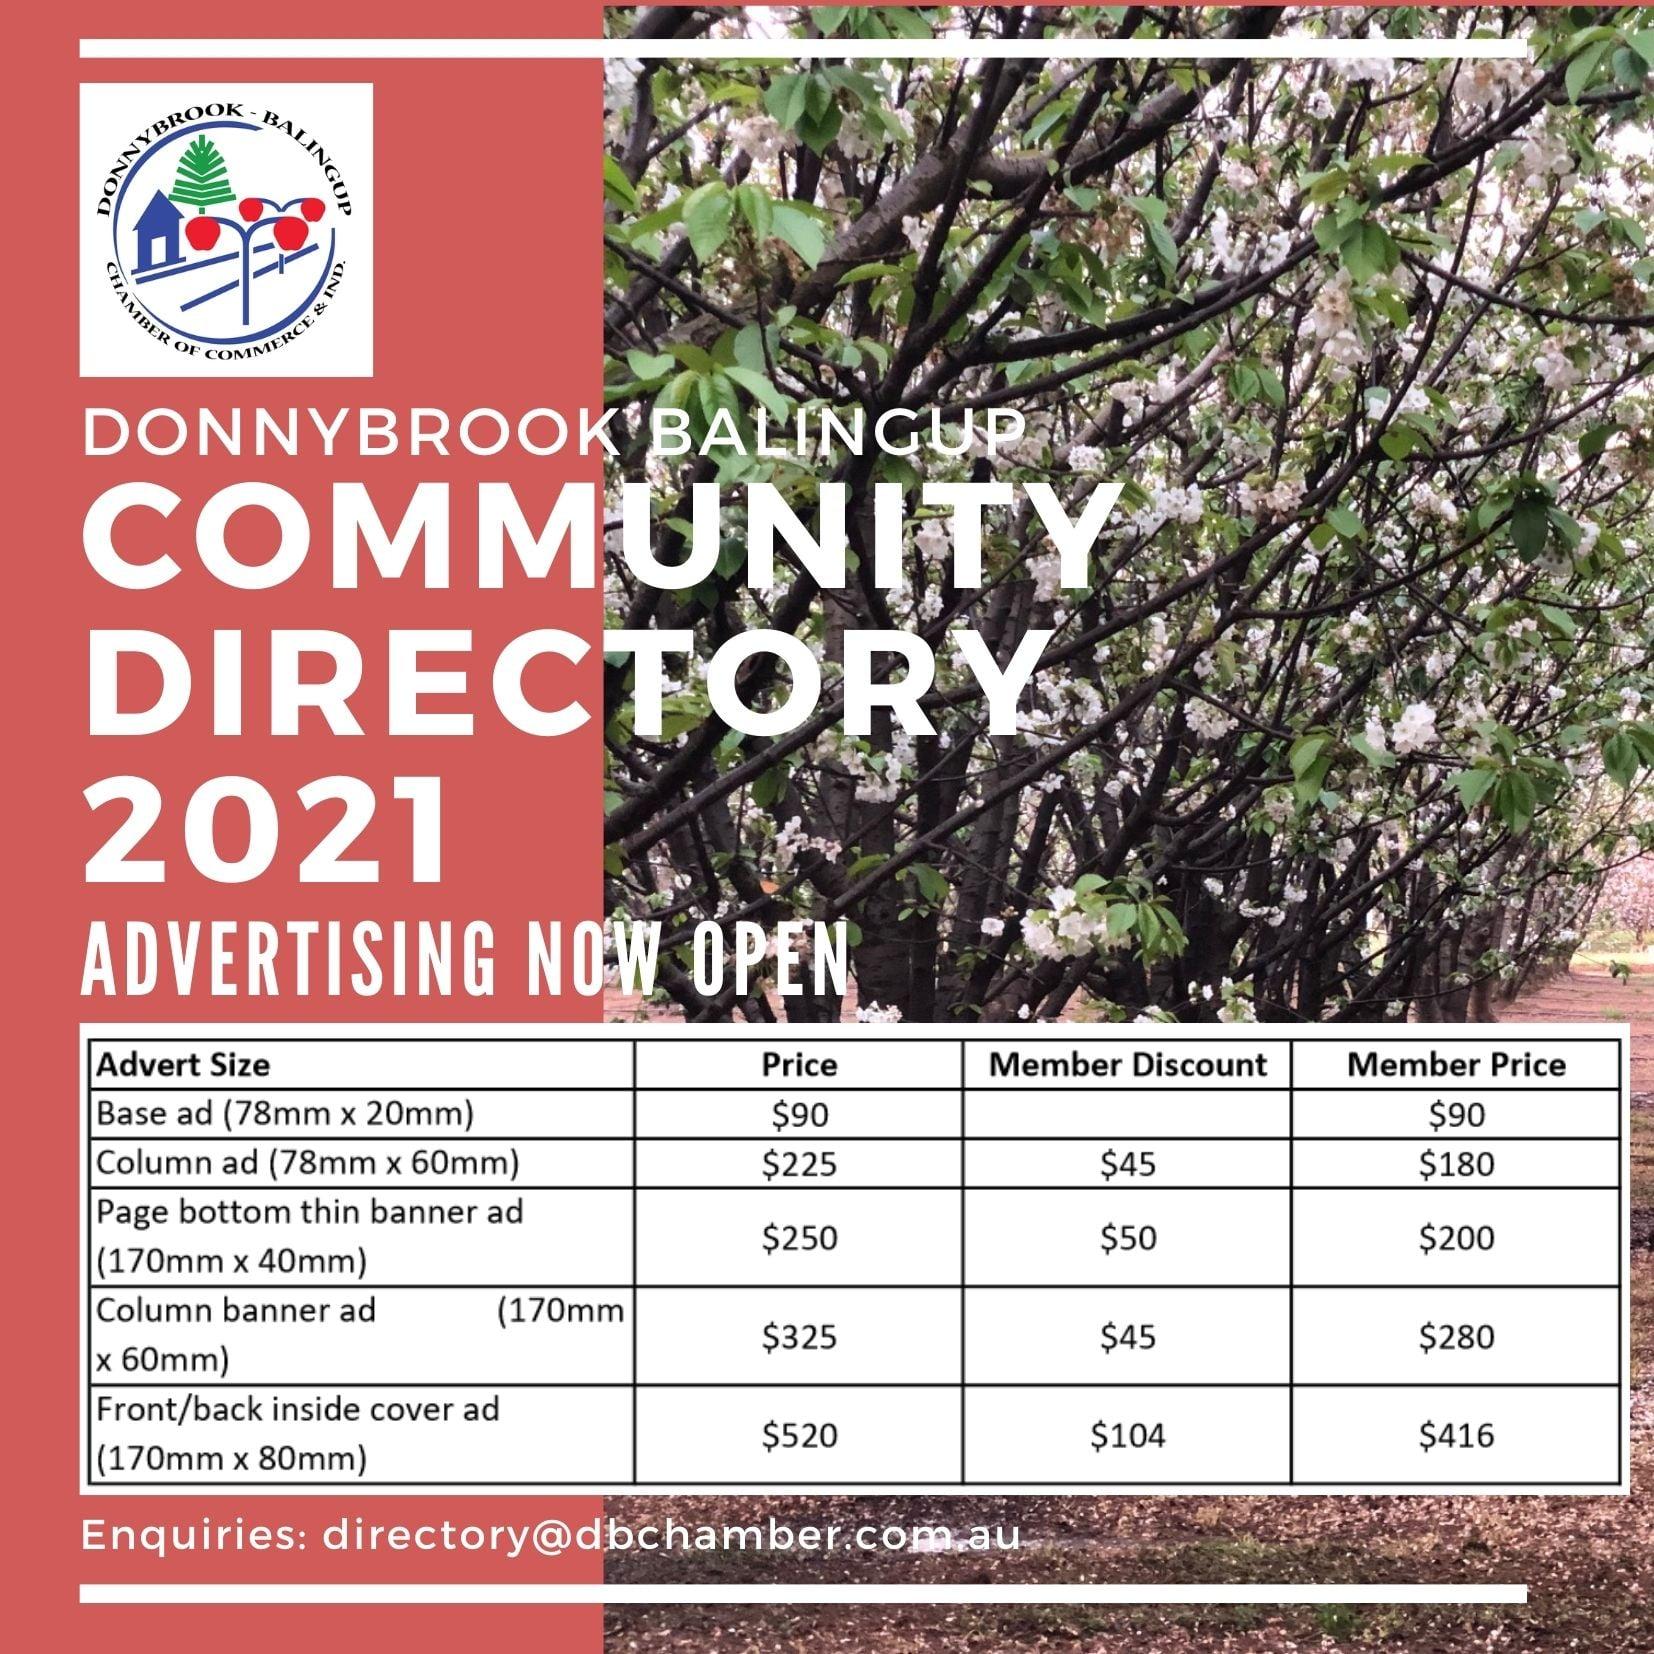 News - Donnybrook Balingup Chamber of Commerce